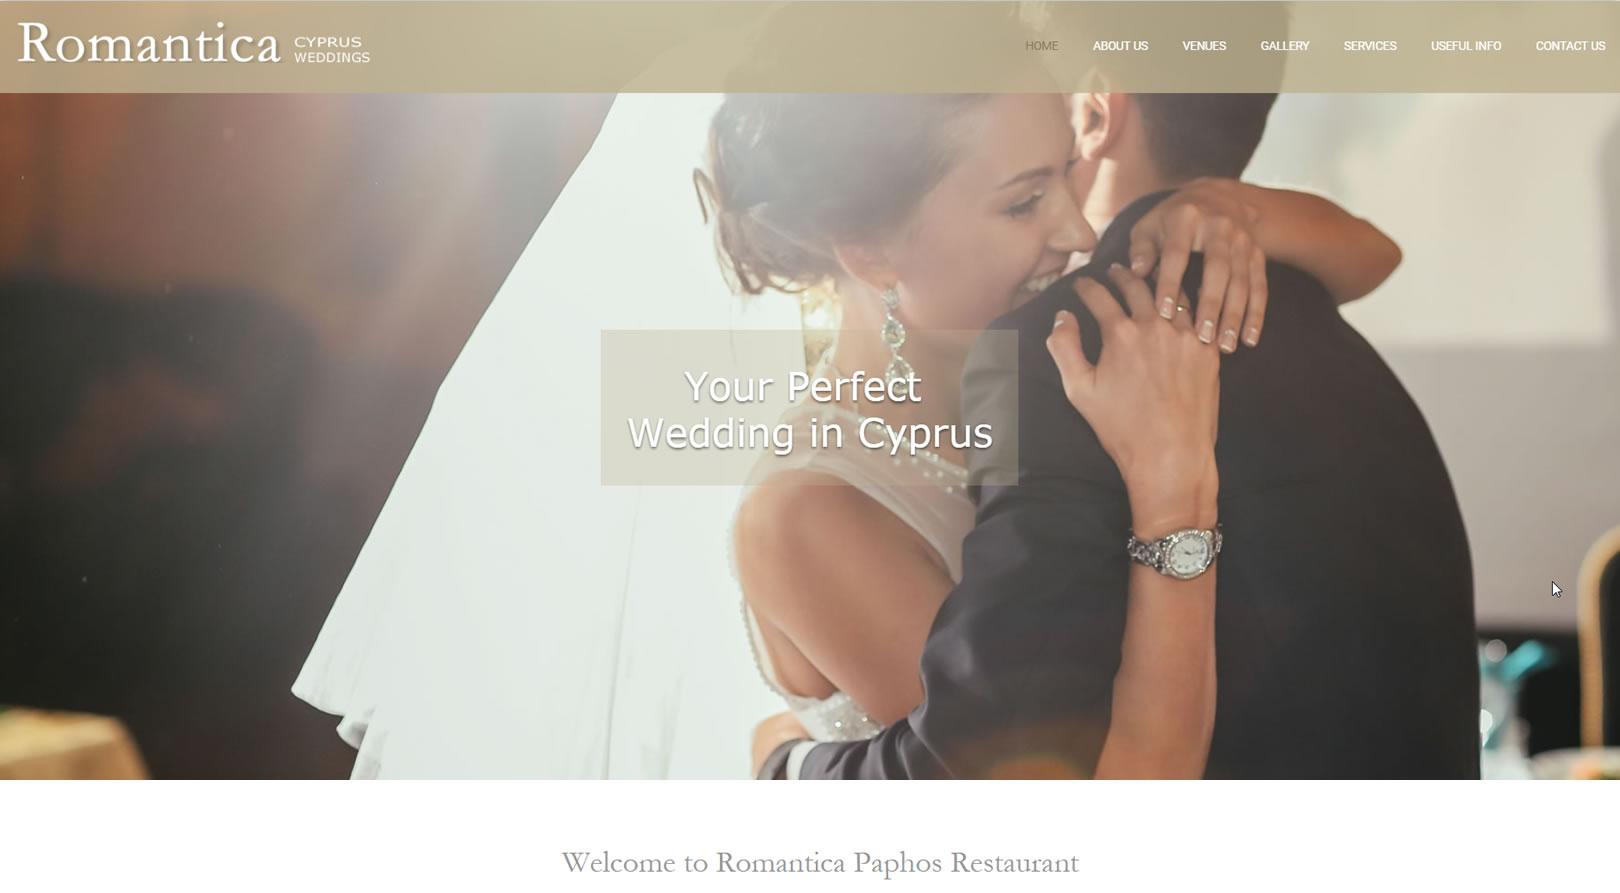 Romantica Weddings Cyprus